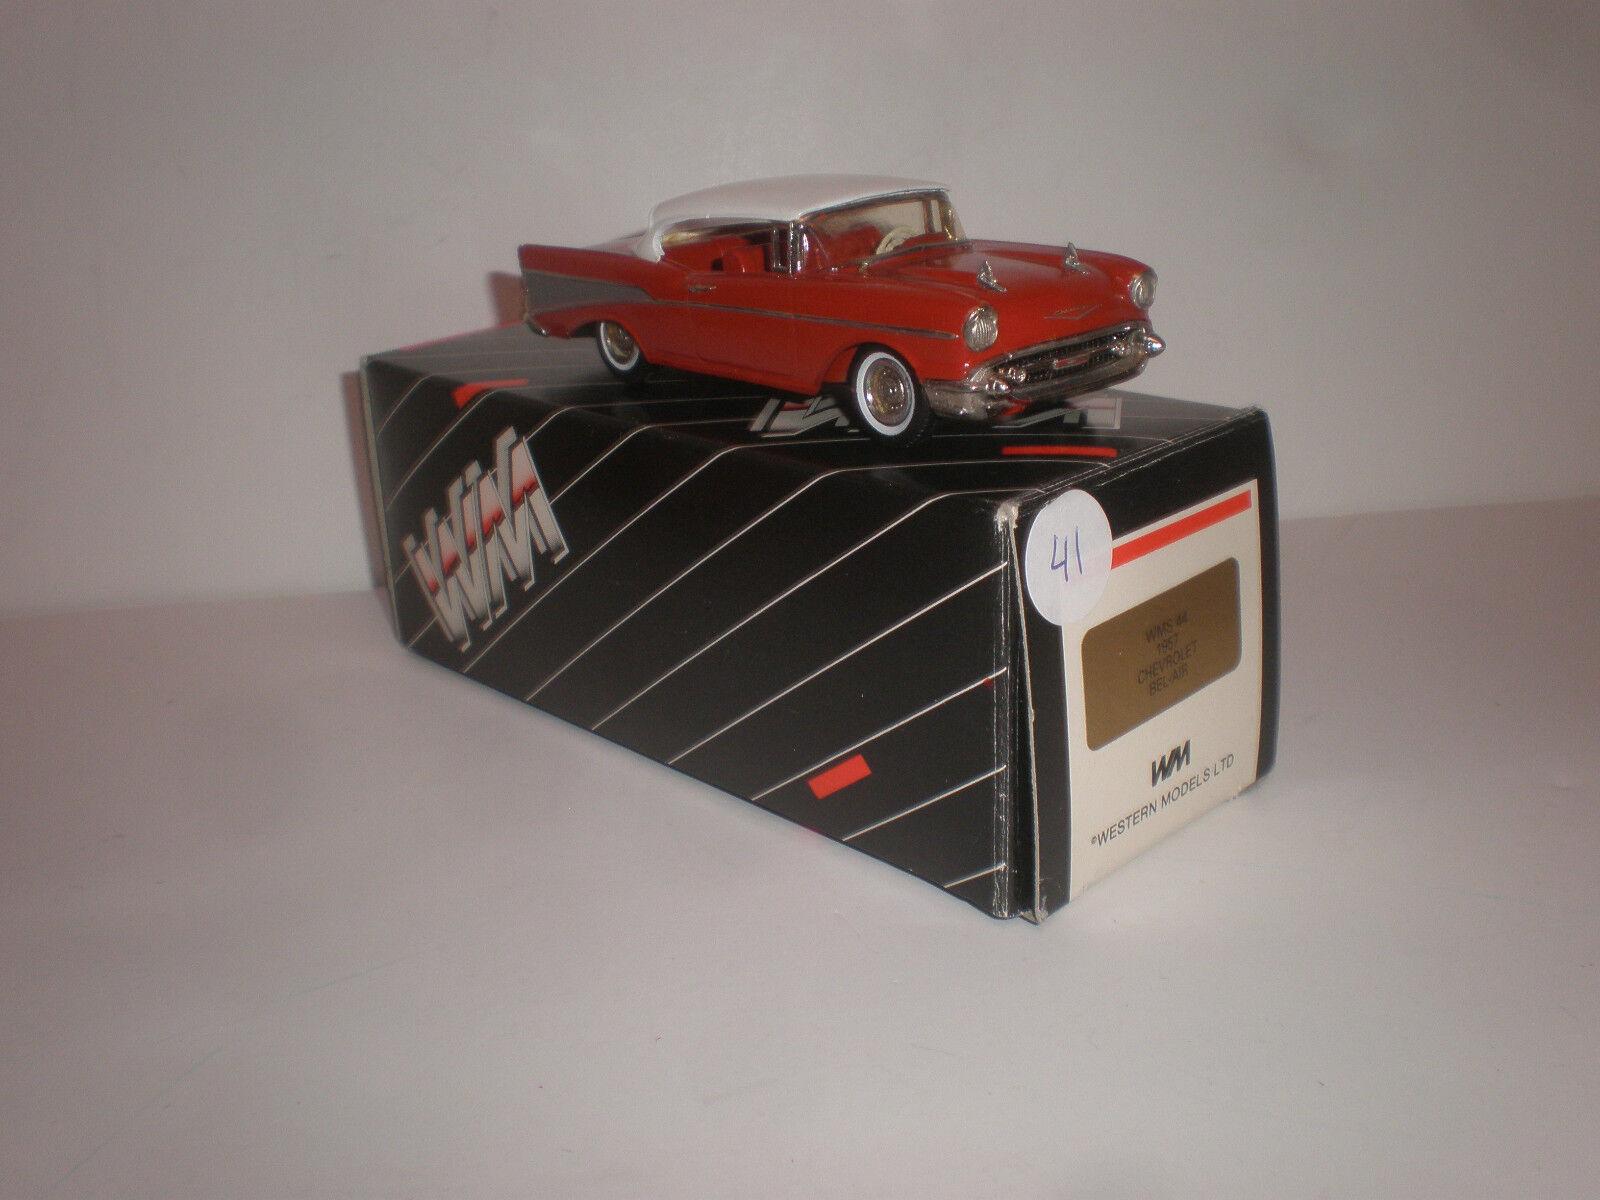 1 43 1957 Chevrolet Bel Luft Hardtop-Coupé Wms 44 Western Models Handgefertigt